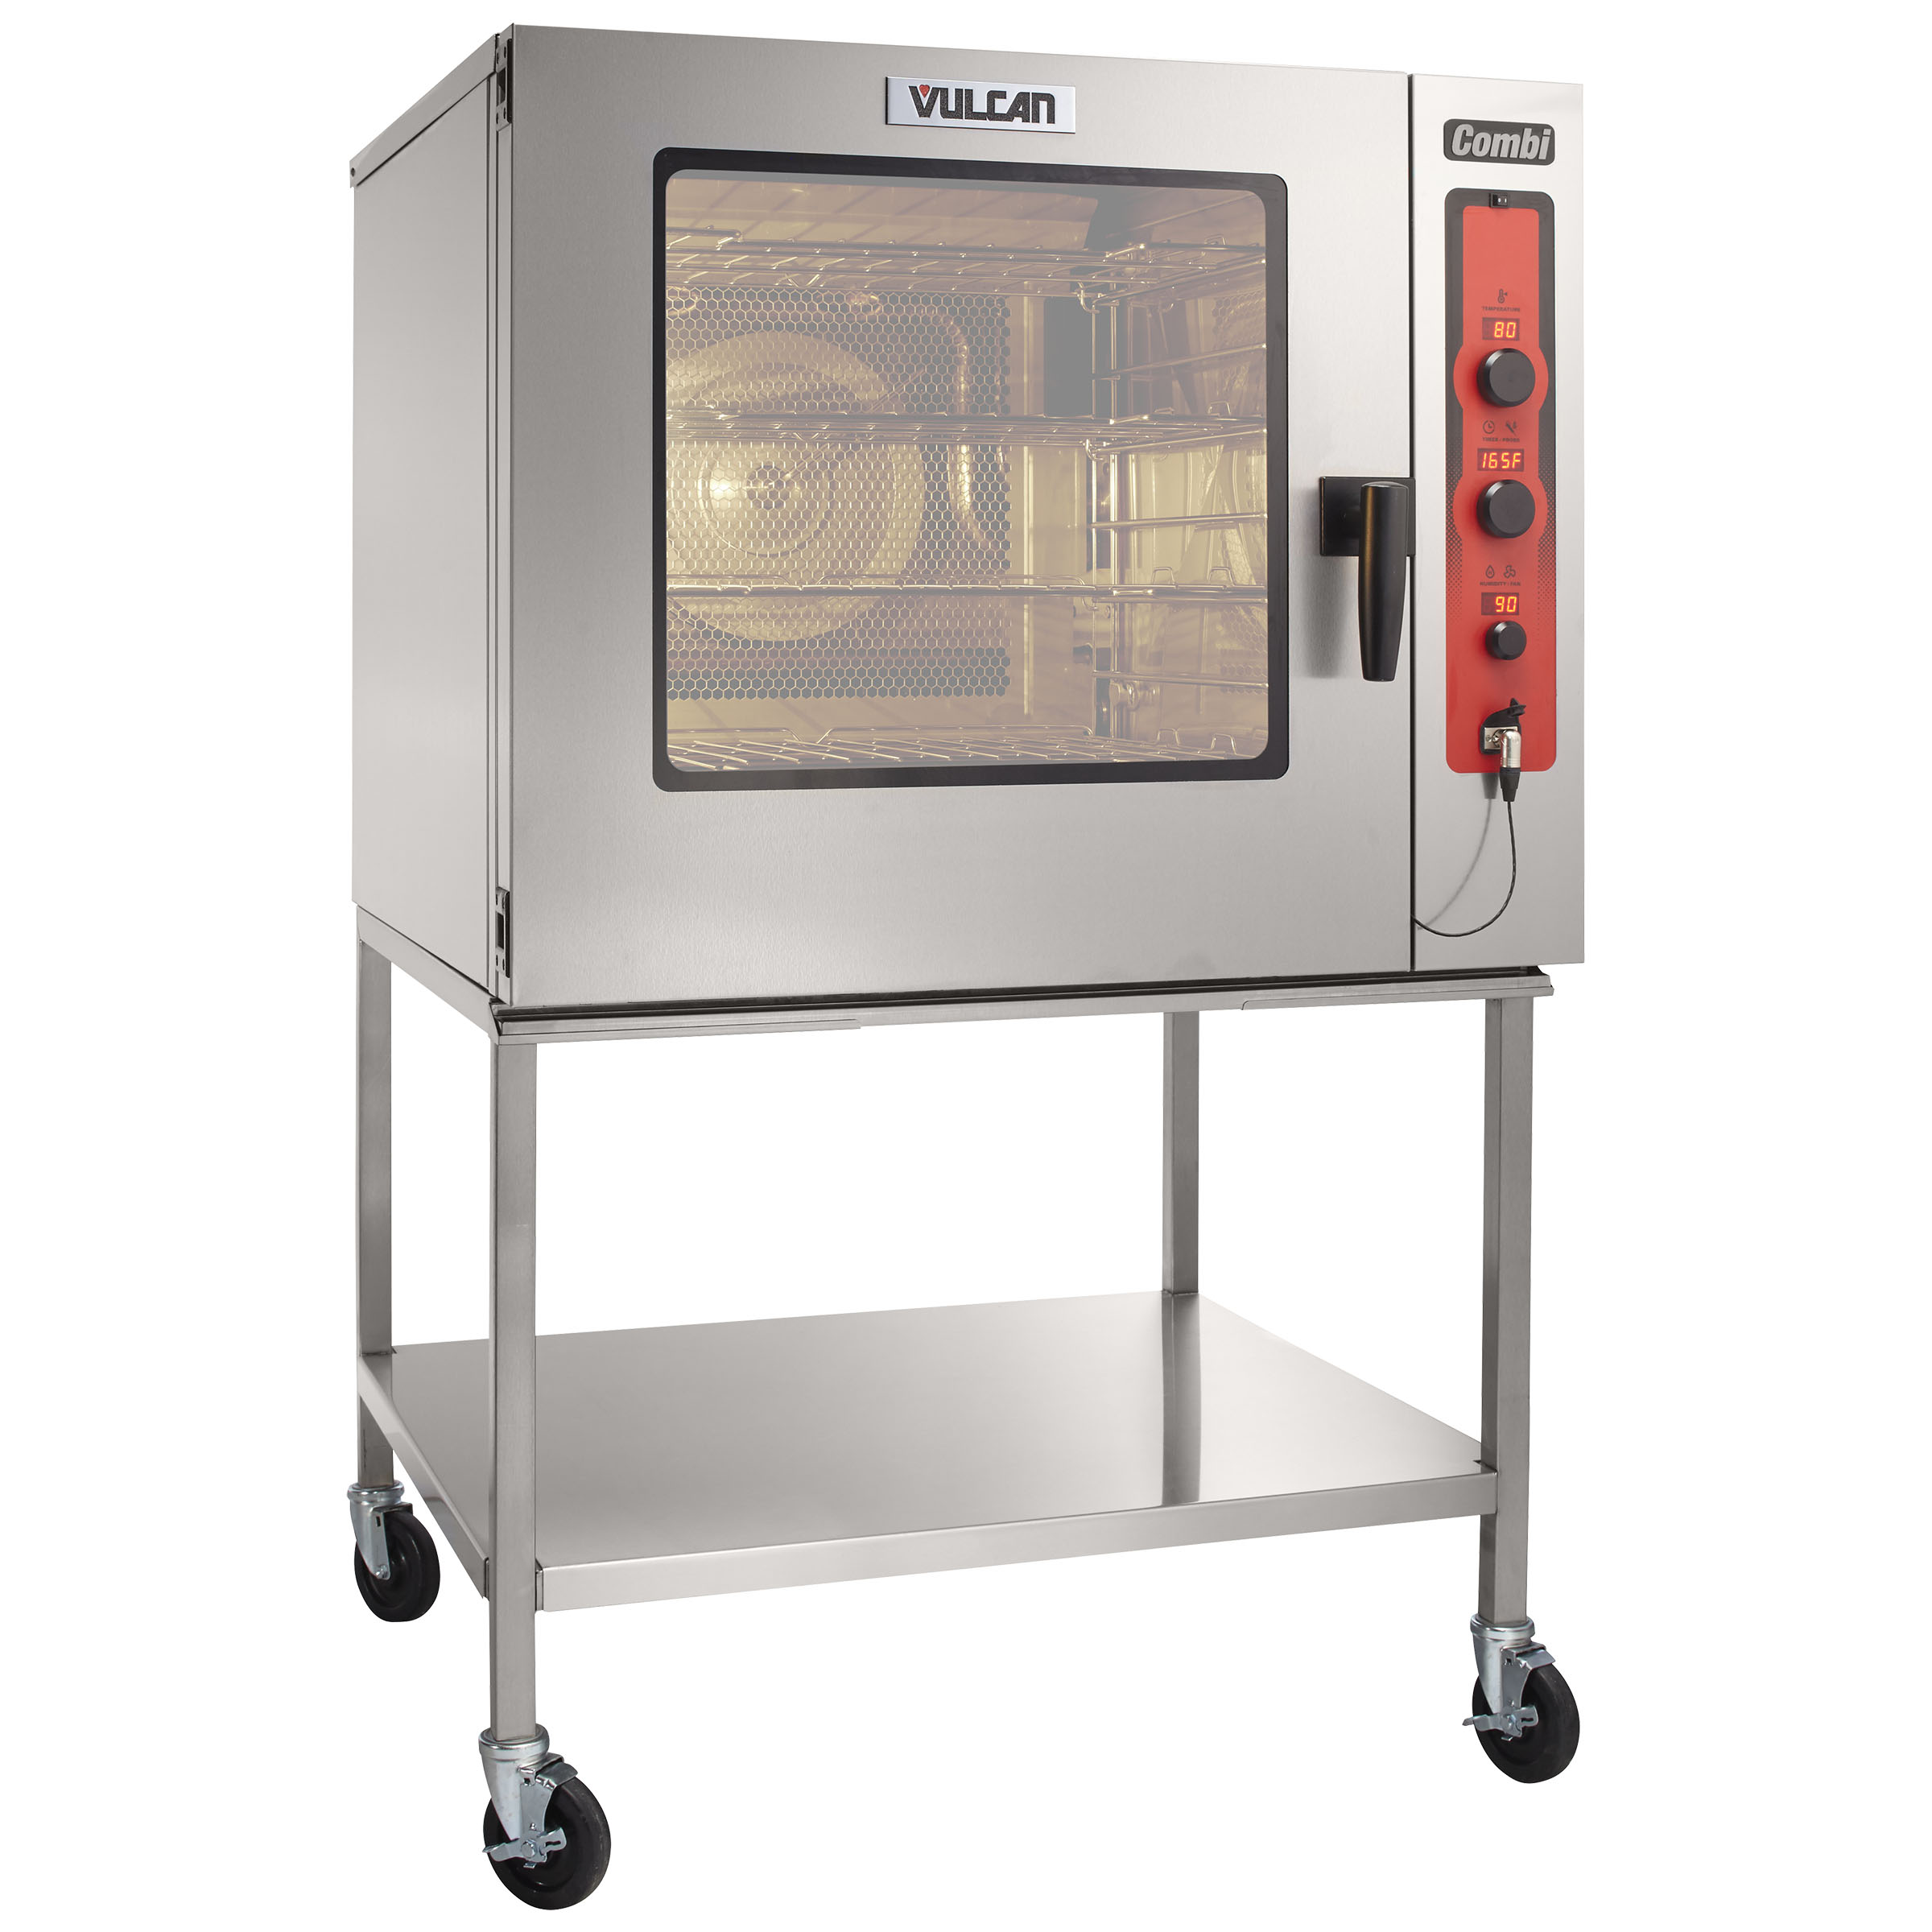 Vulcan ABC7E-240P combi oven, electric